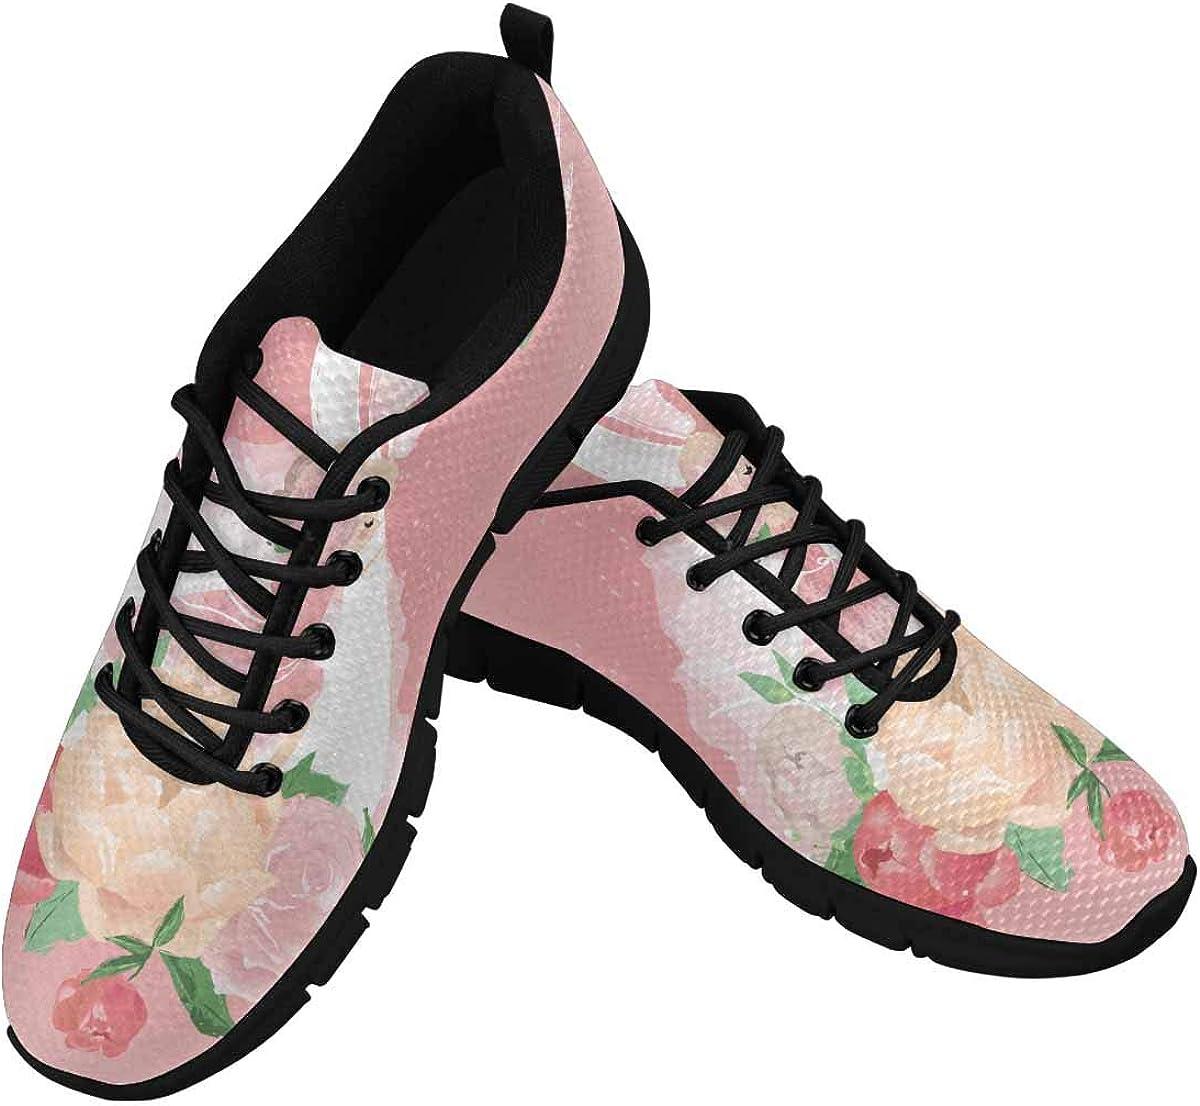 INTERESTPRINT Beautiful San Diego Mall White Swan New Shipping Free Shipping with Women's Flora Sneaker La